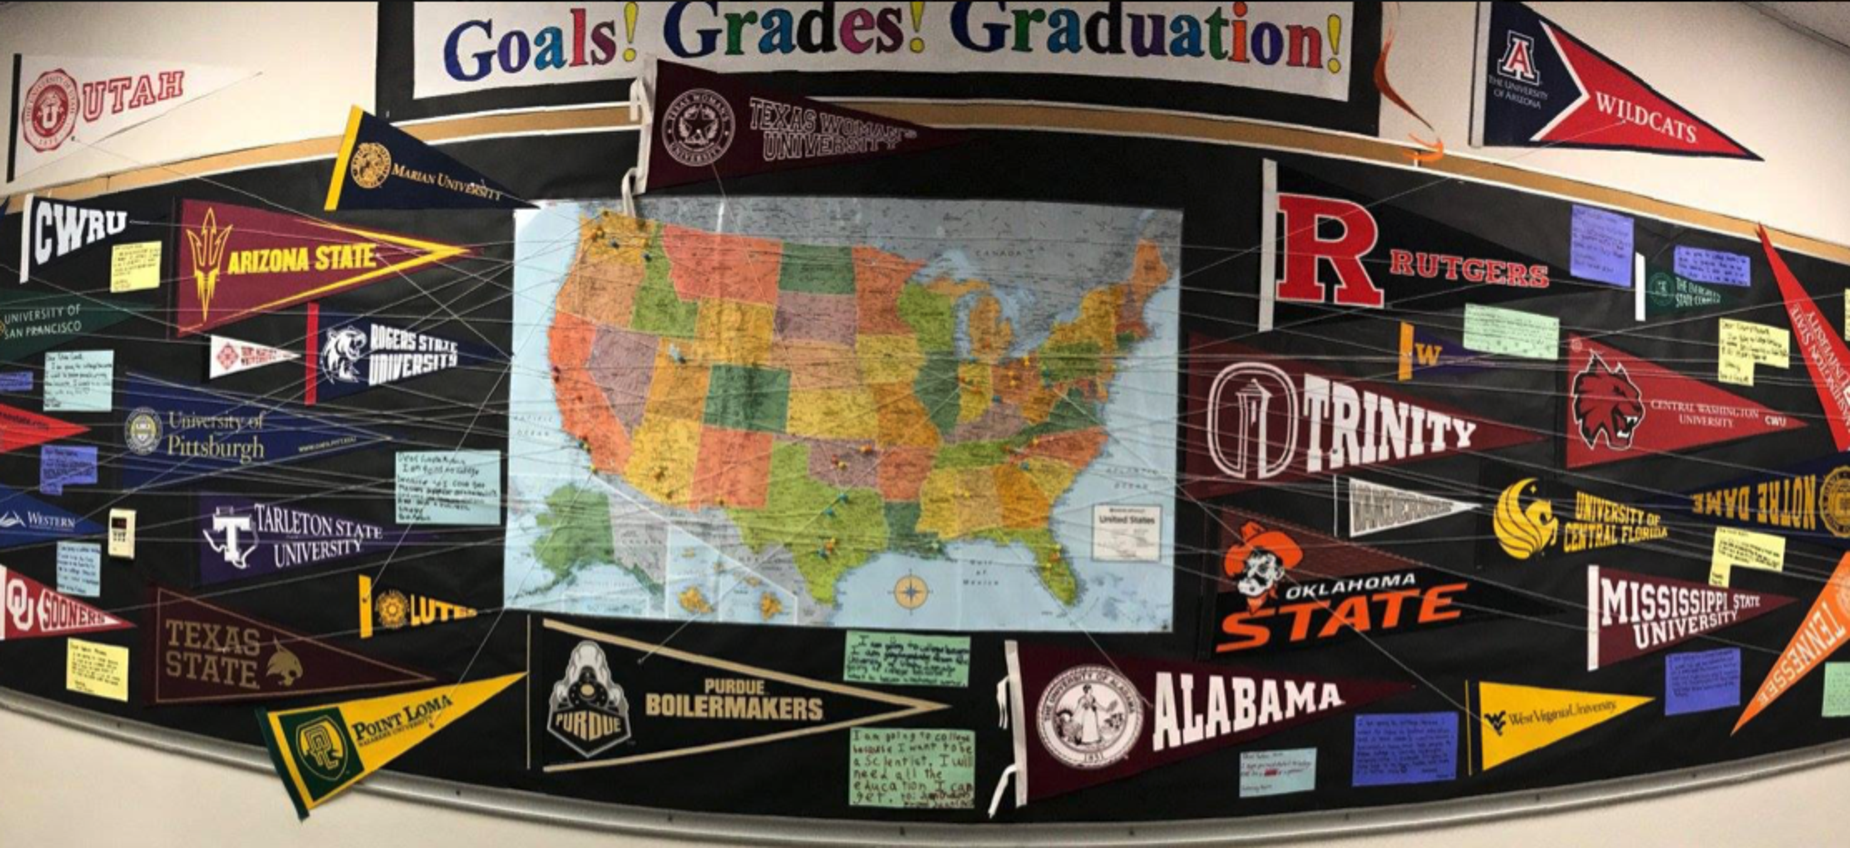 Image, Graduation Goals